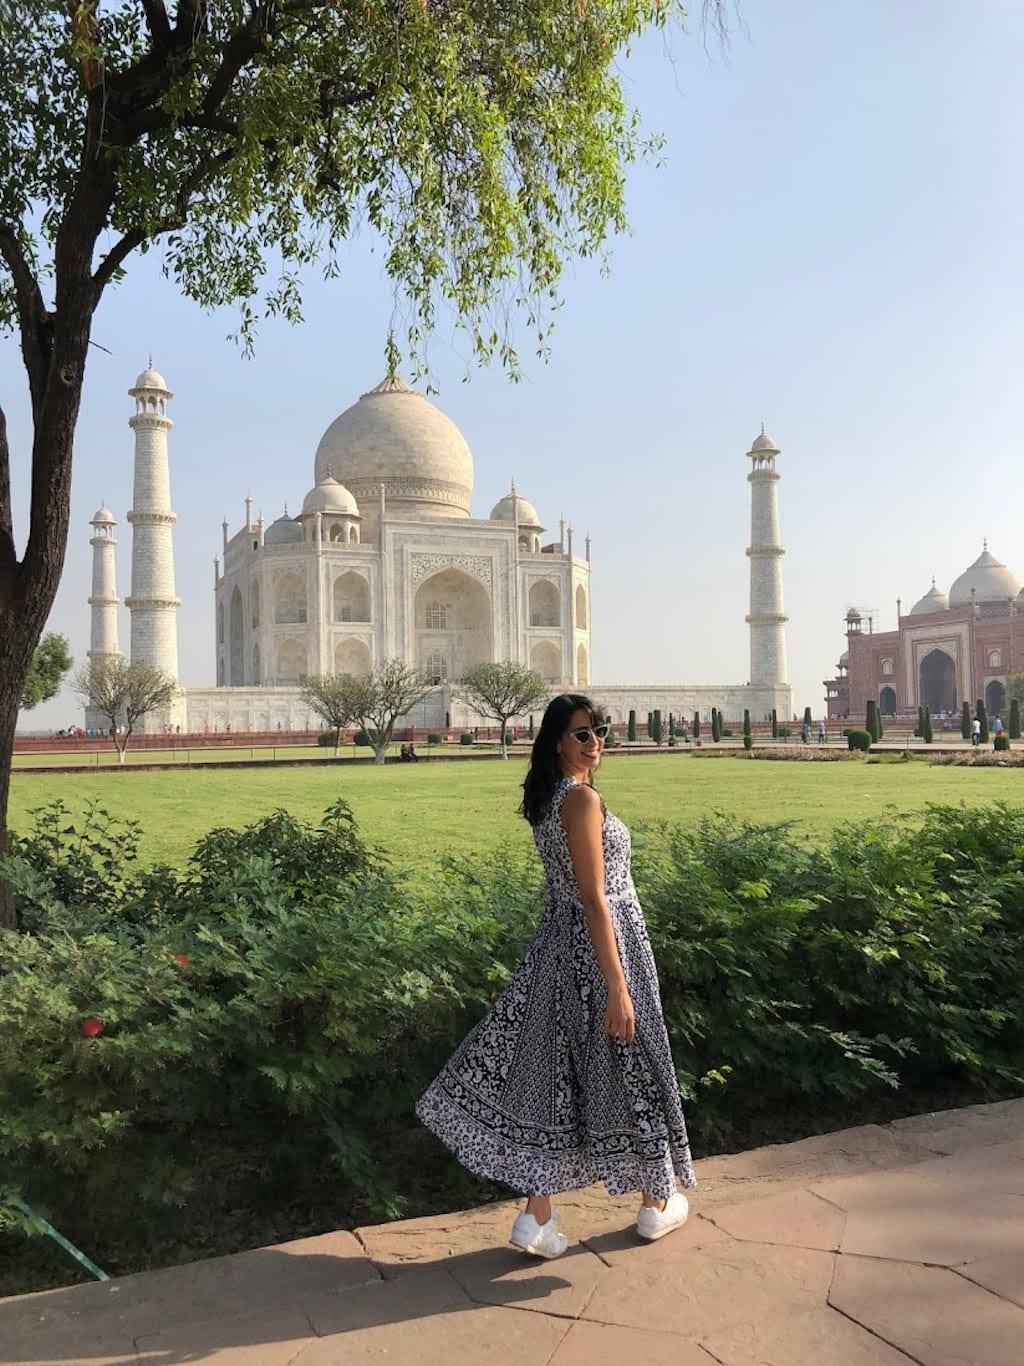 Que roupa usar no Taj Mahal